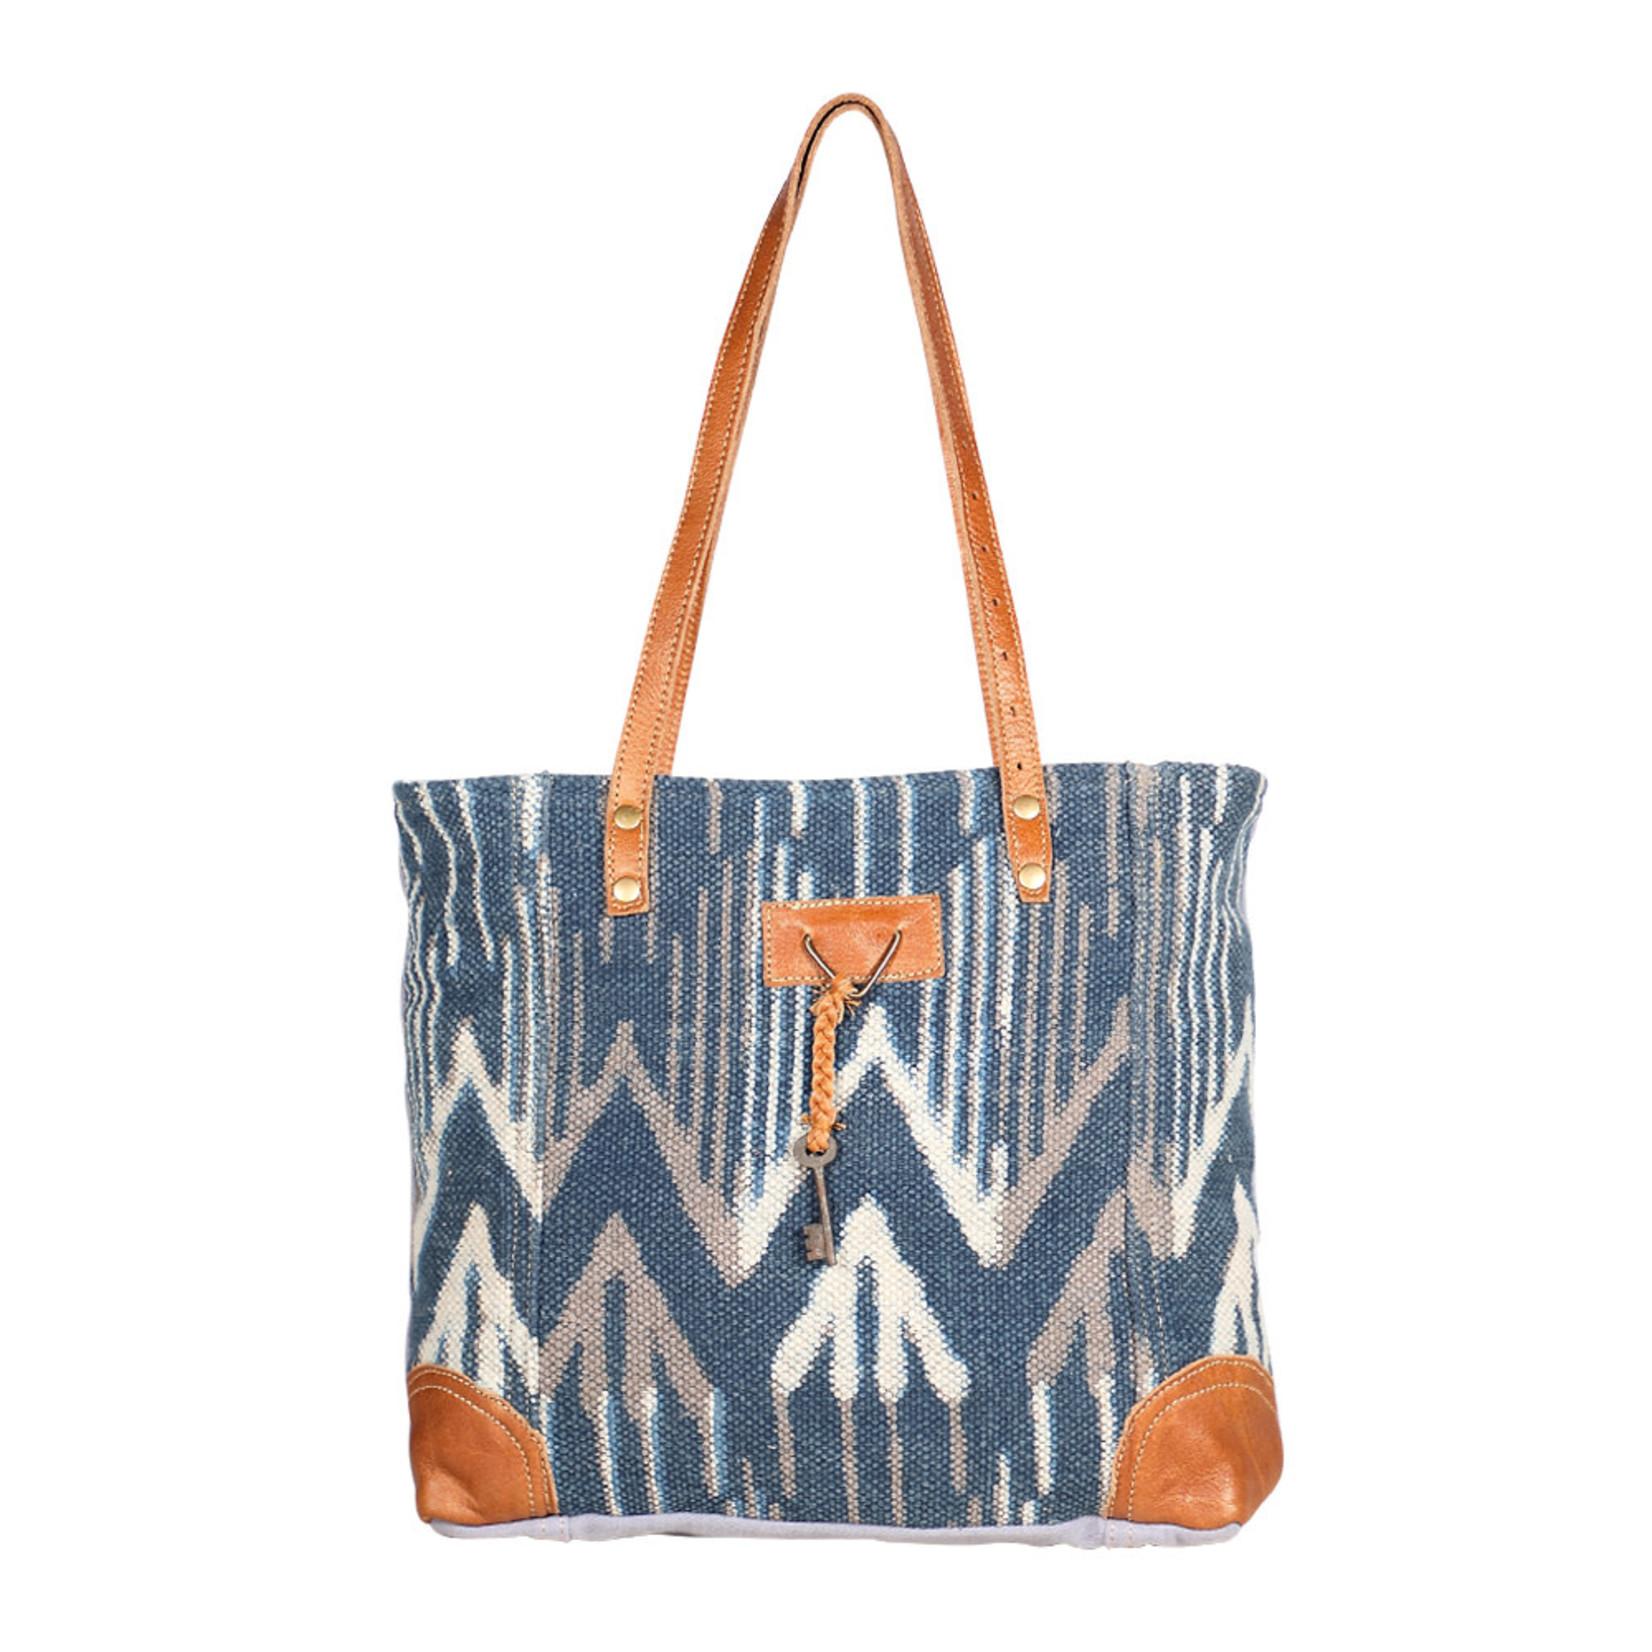 Myra Bags S-1955 Beholden Blue Tote Bag